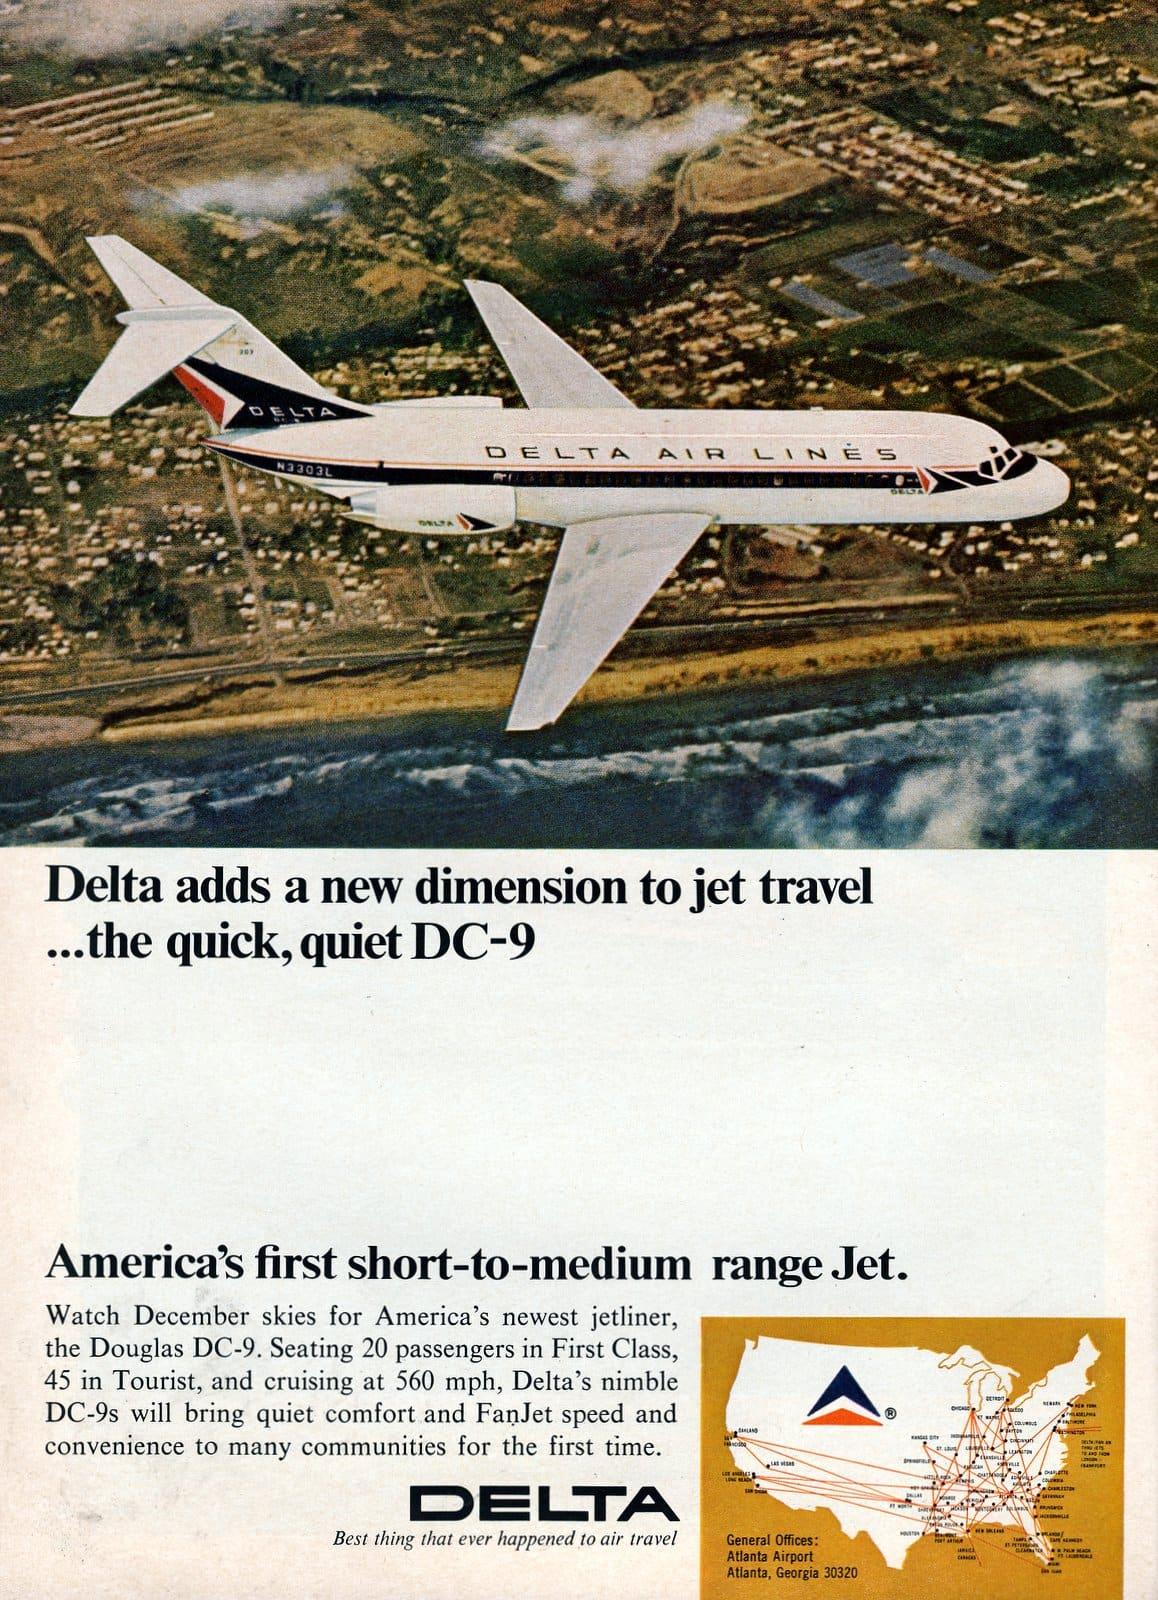 Delta Airlines vintage DC-9 planes (1965)